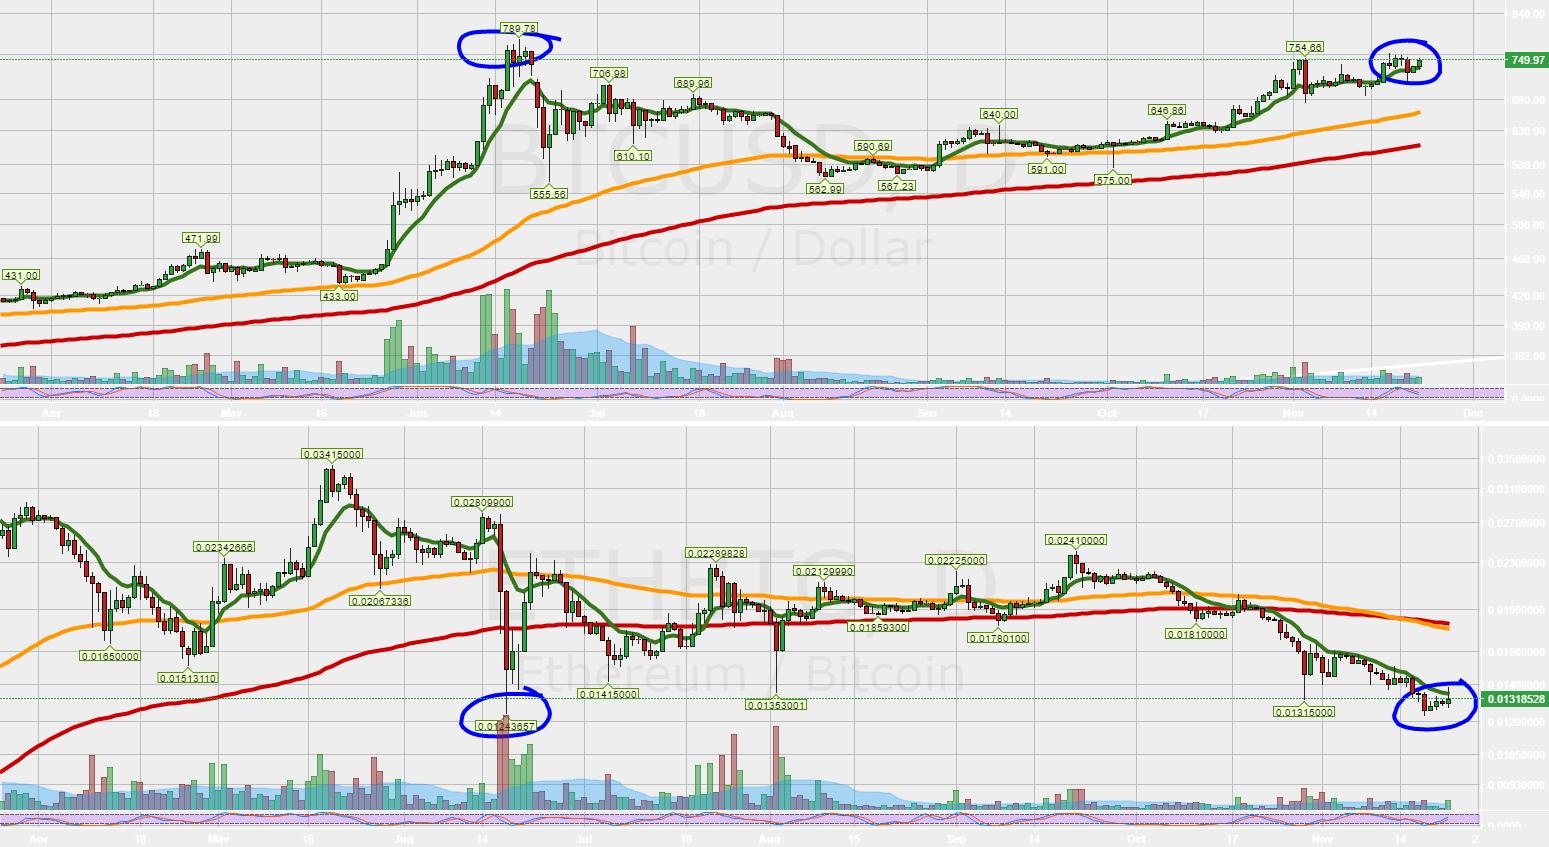 If Bitcoin ups here, ETH down